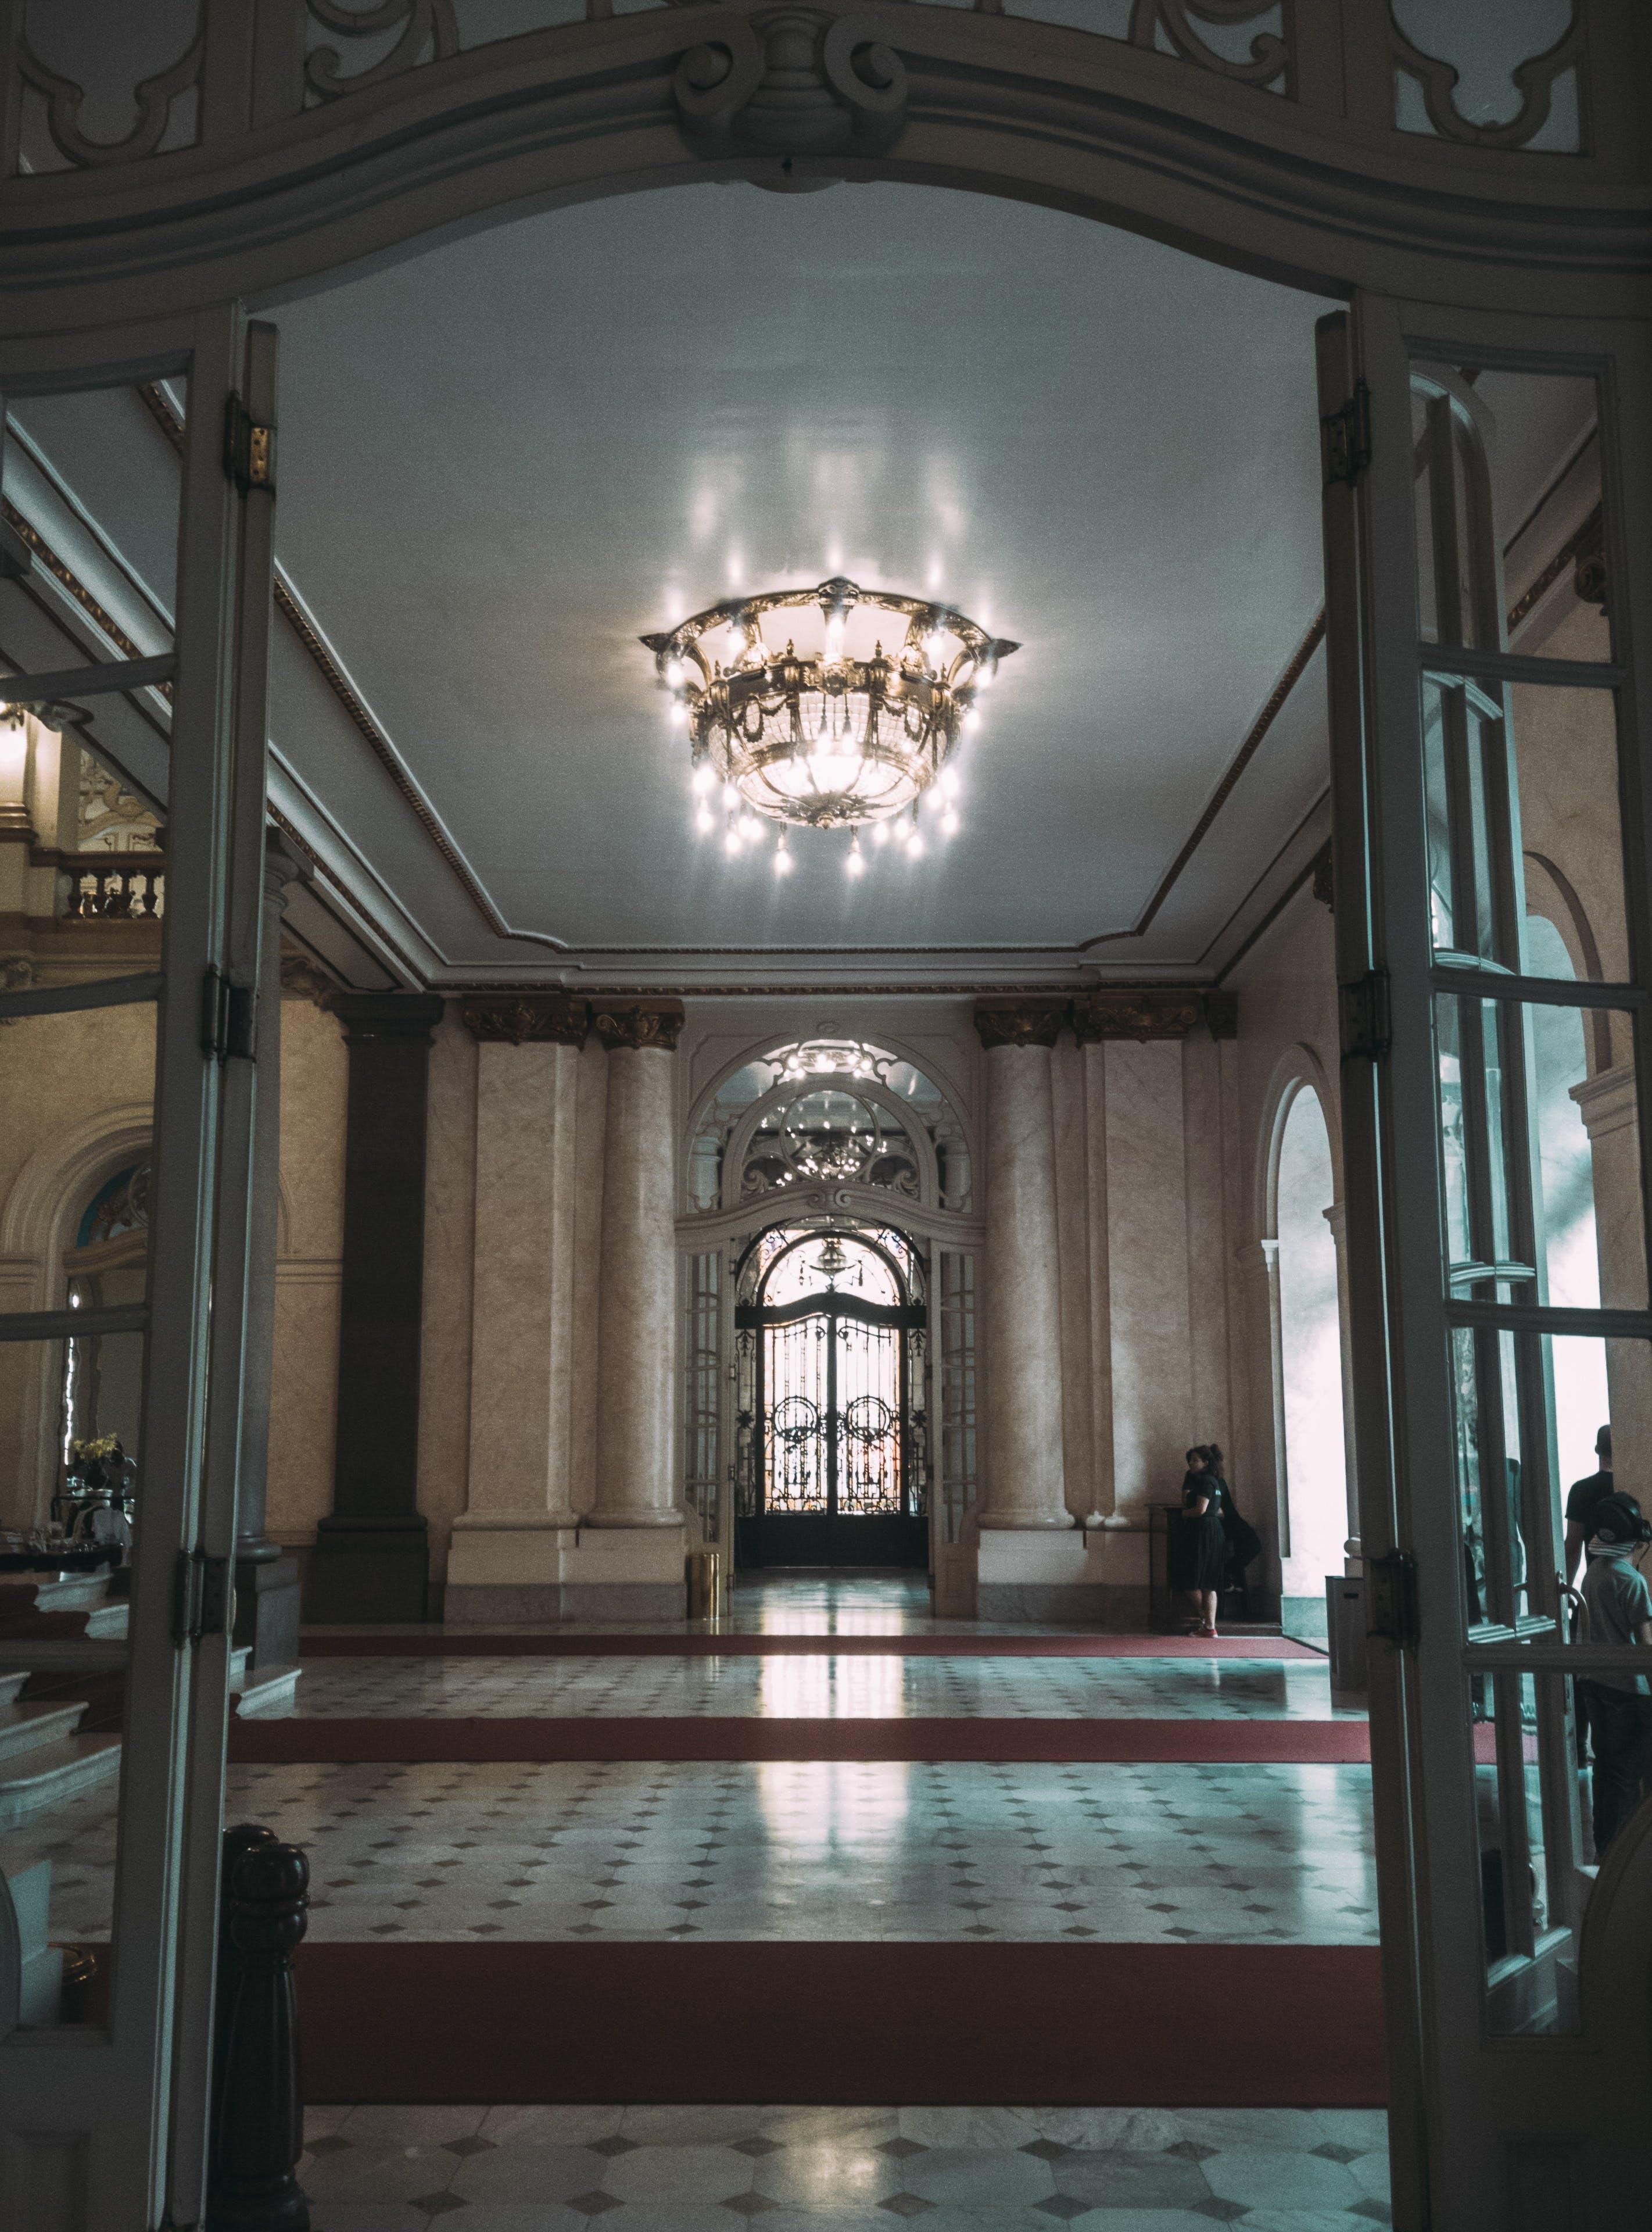 Kostenloses Stock Foto zu architektur, basilika, bogen, decke